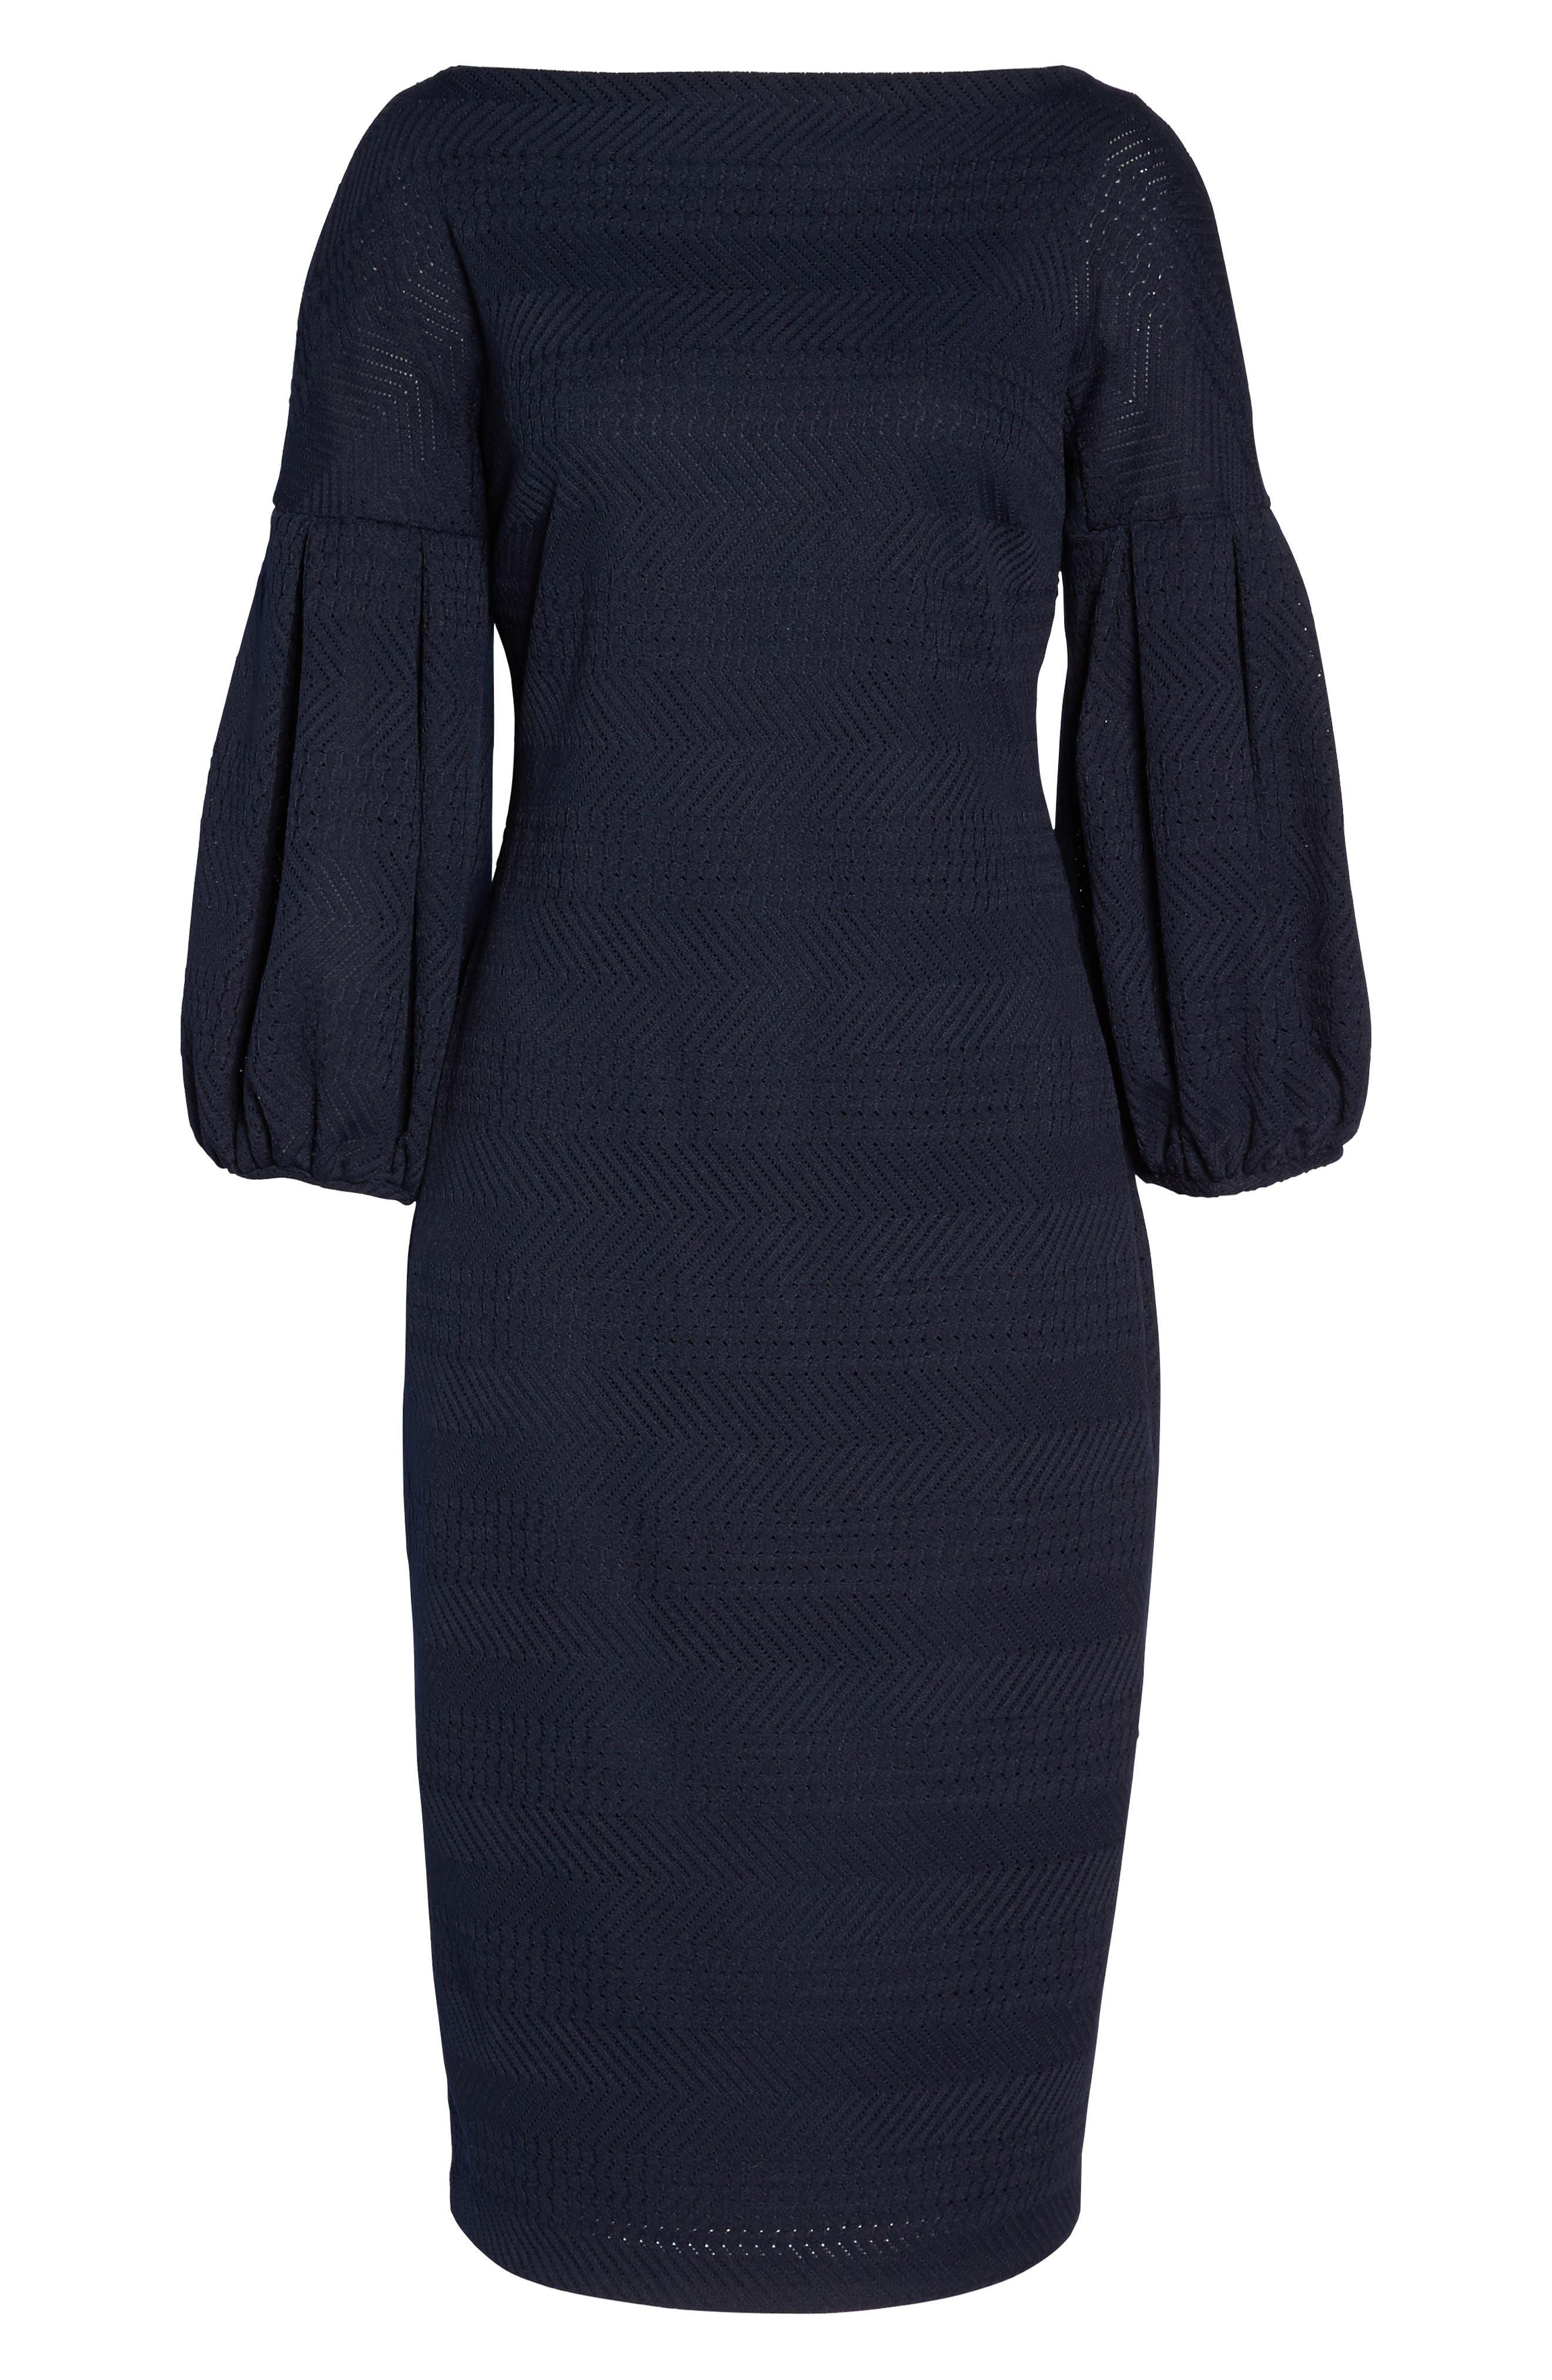 Solid Herringbone Knit Dress,                             Alternate thumbnail 6, color,                             Navy